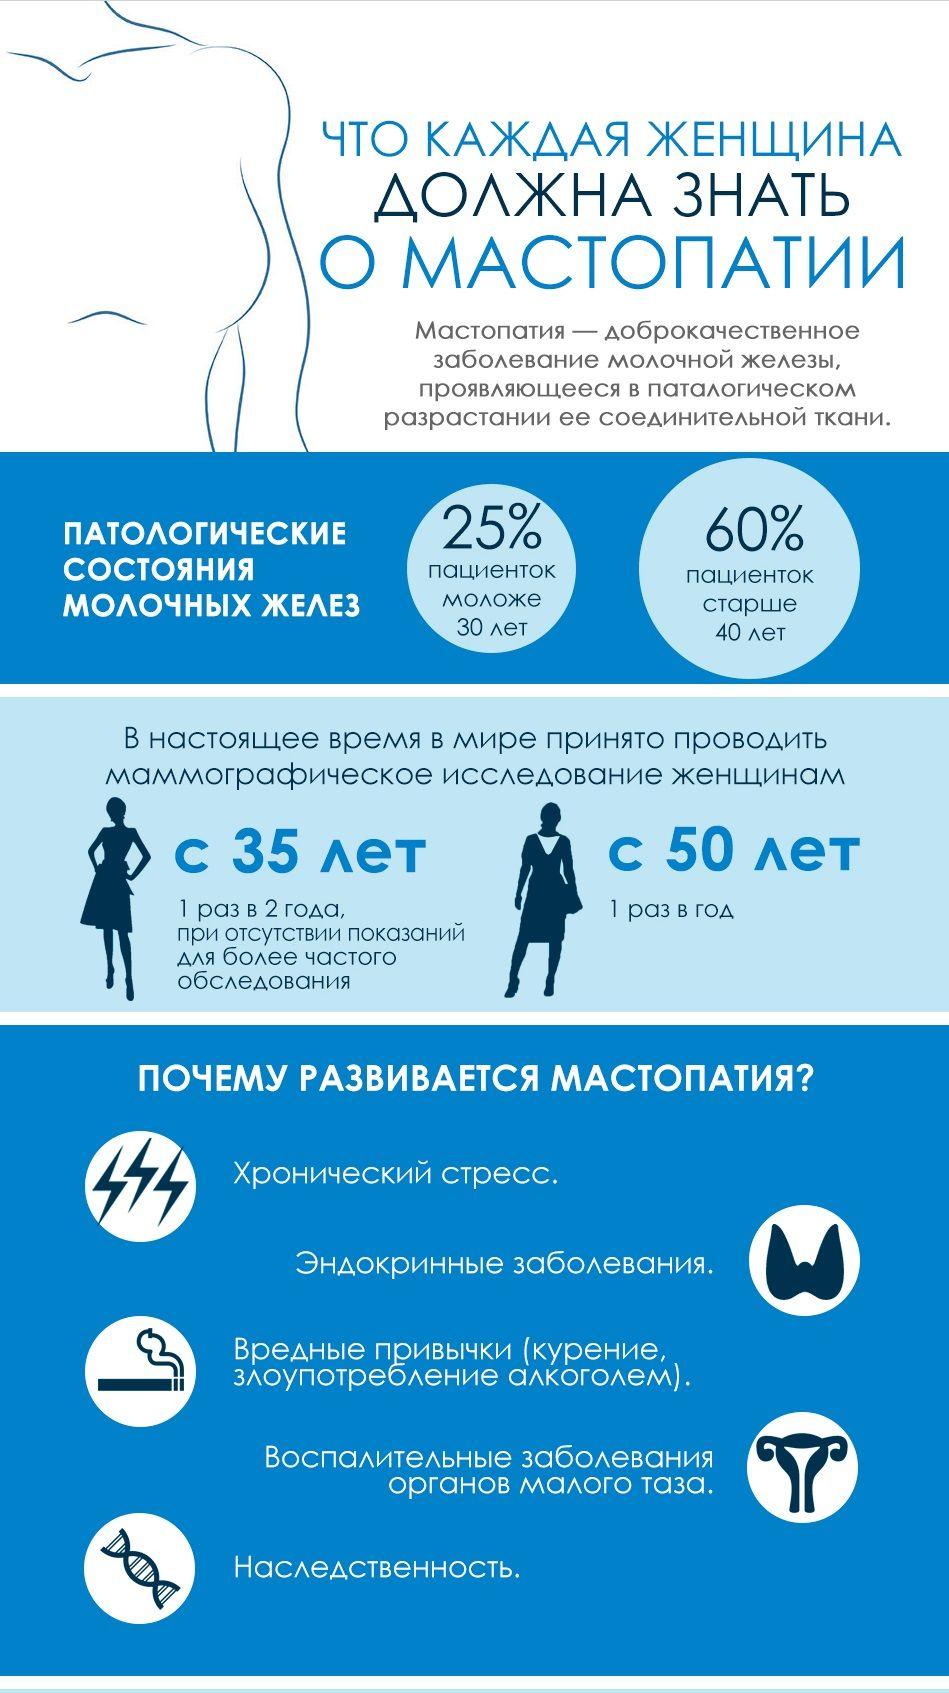 Мастопатия молочной железы 2